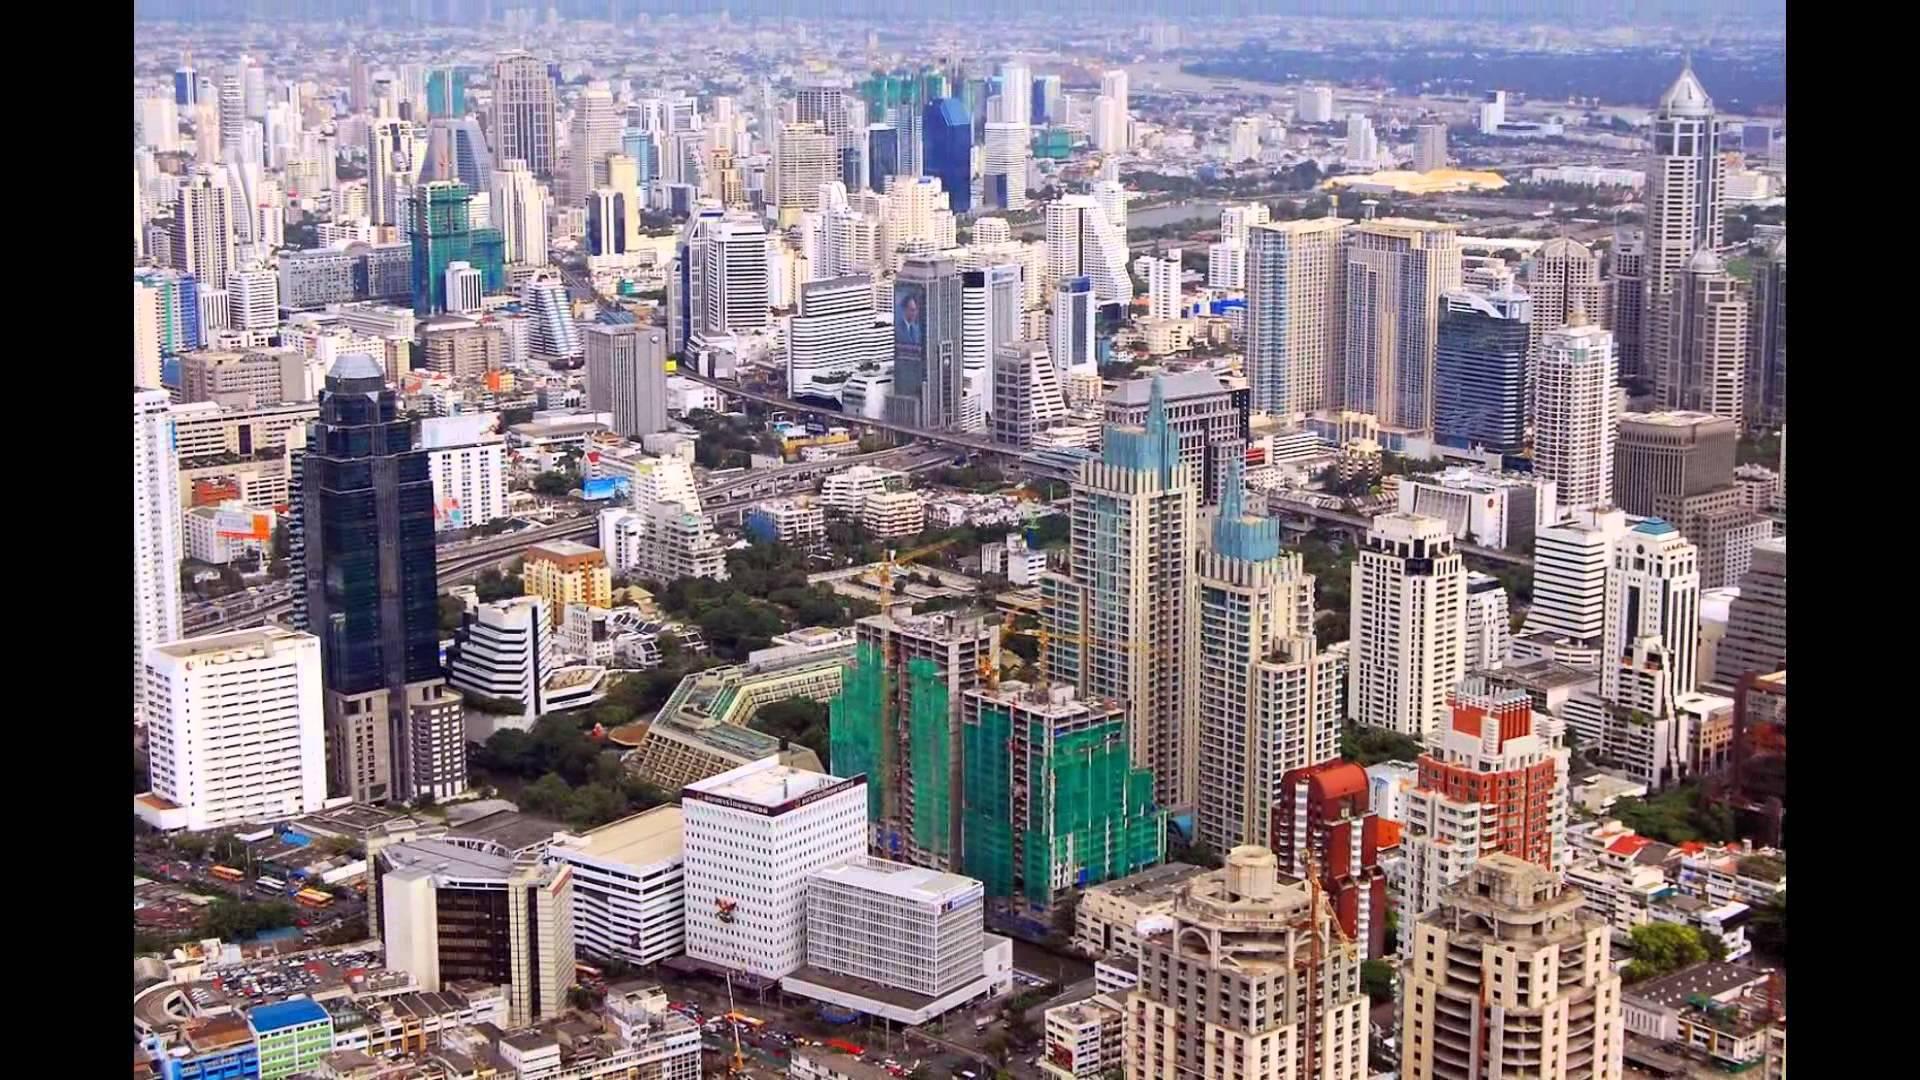 Thailand city photo